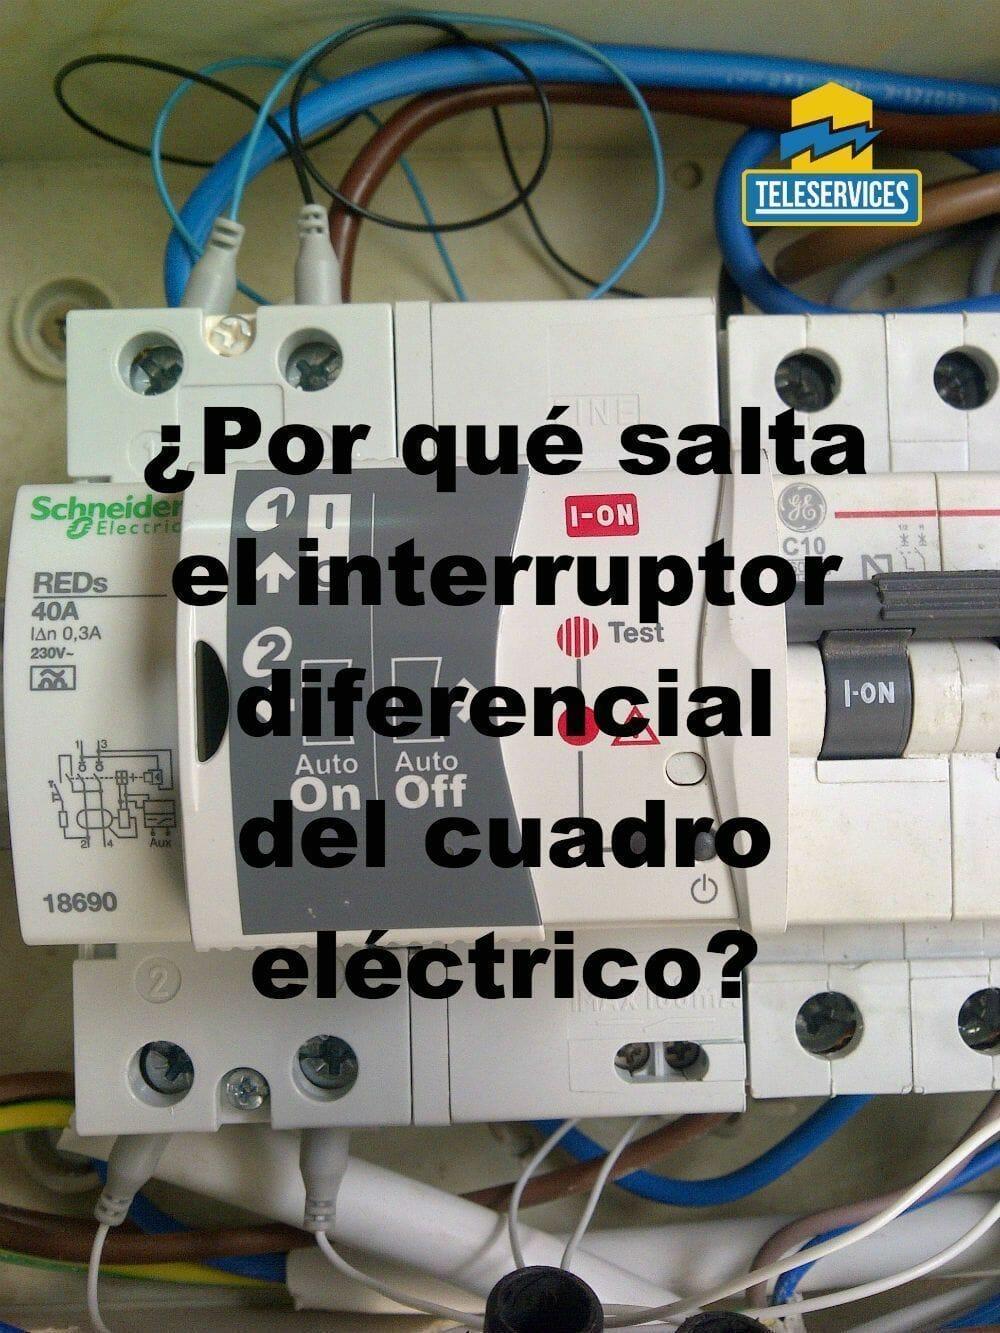 salta el interruptor diferencial